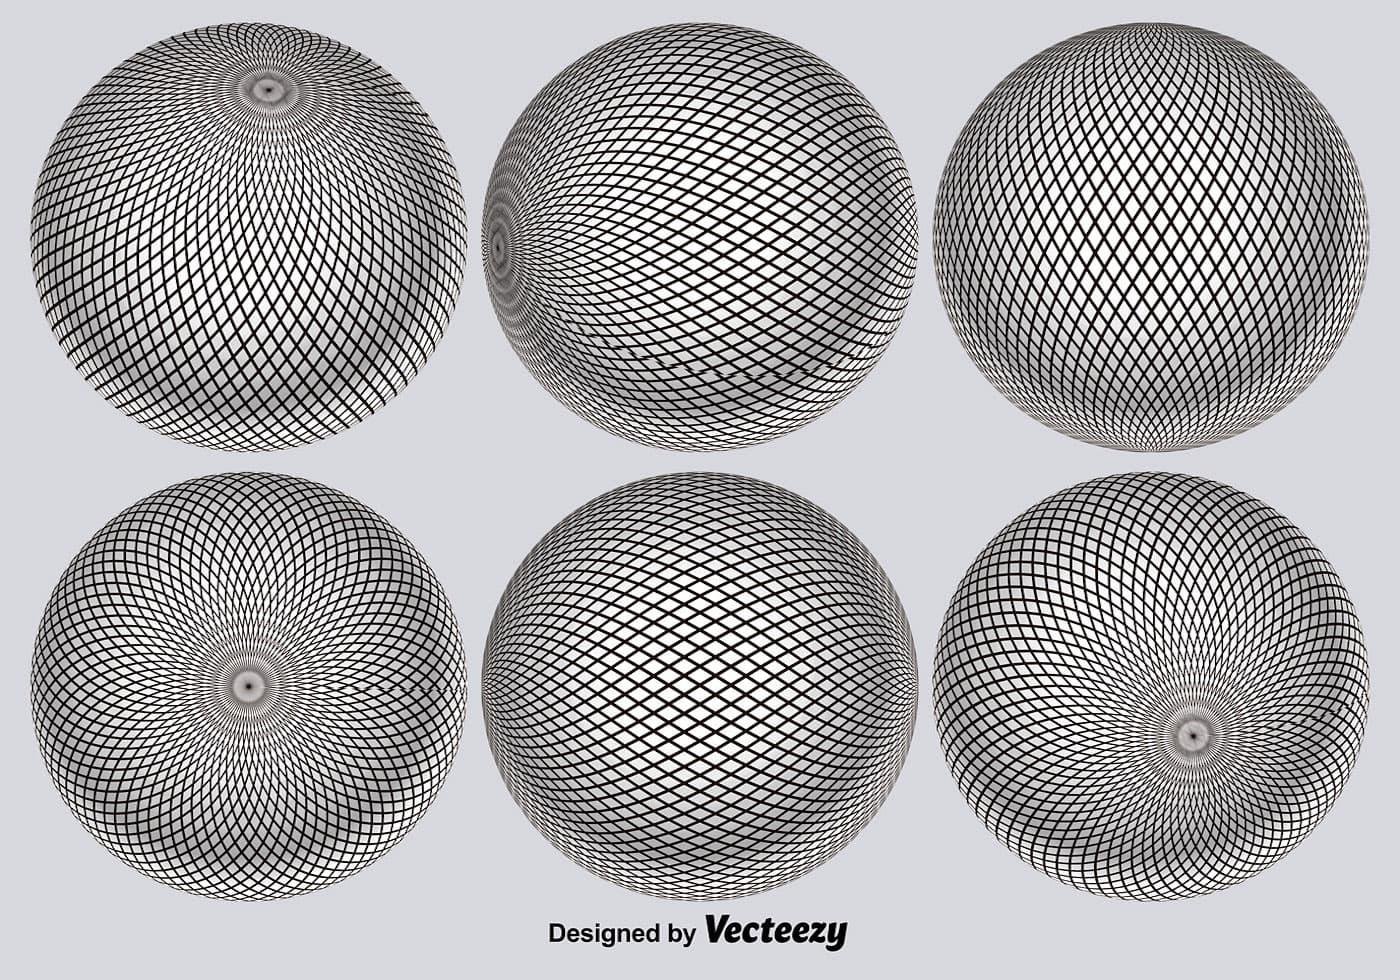 Vector 3D Globe Grid Set - Download Free Vector Art, Stock Graphics ...